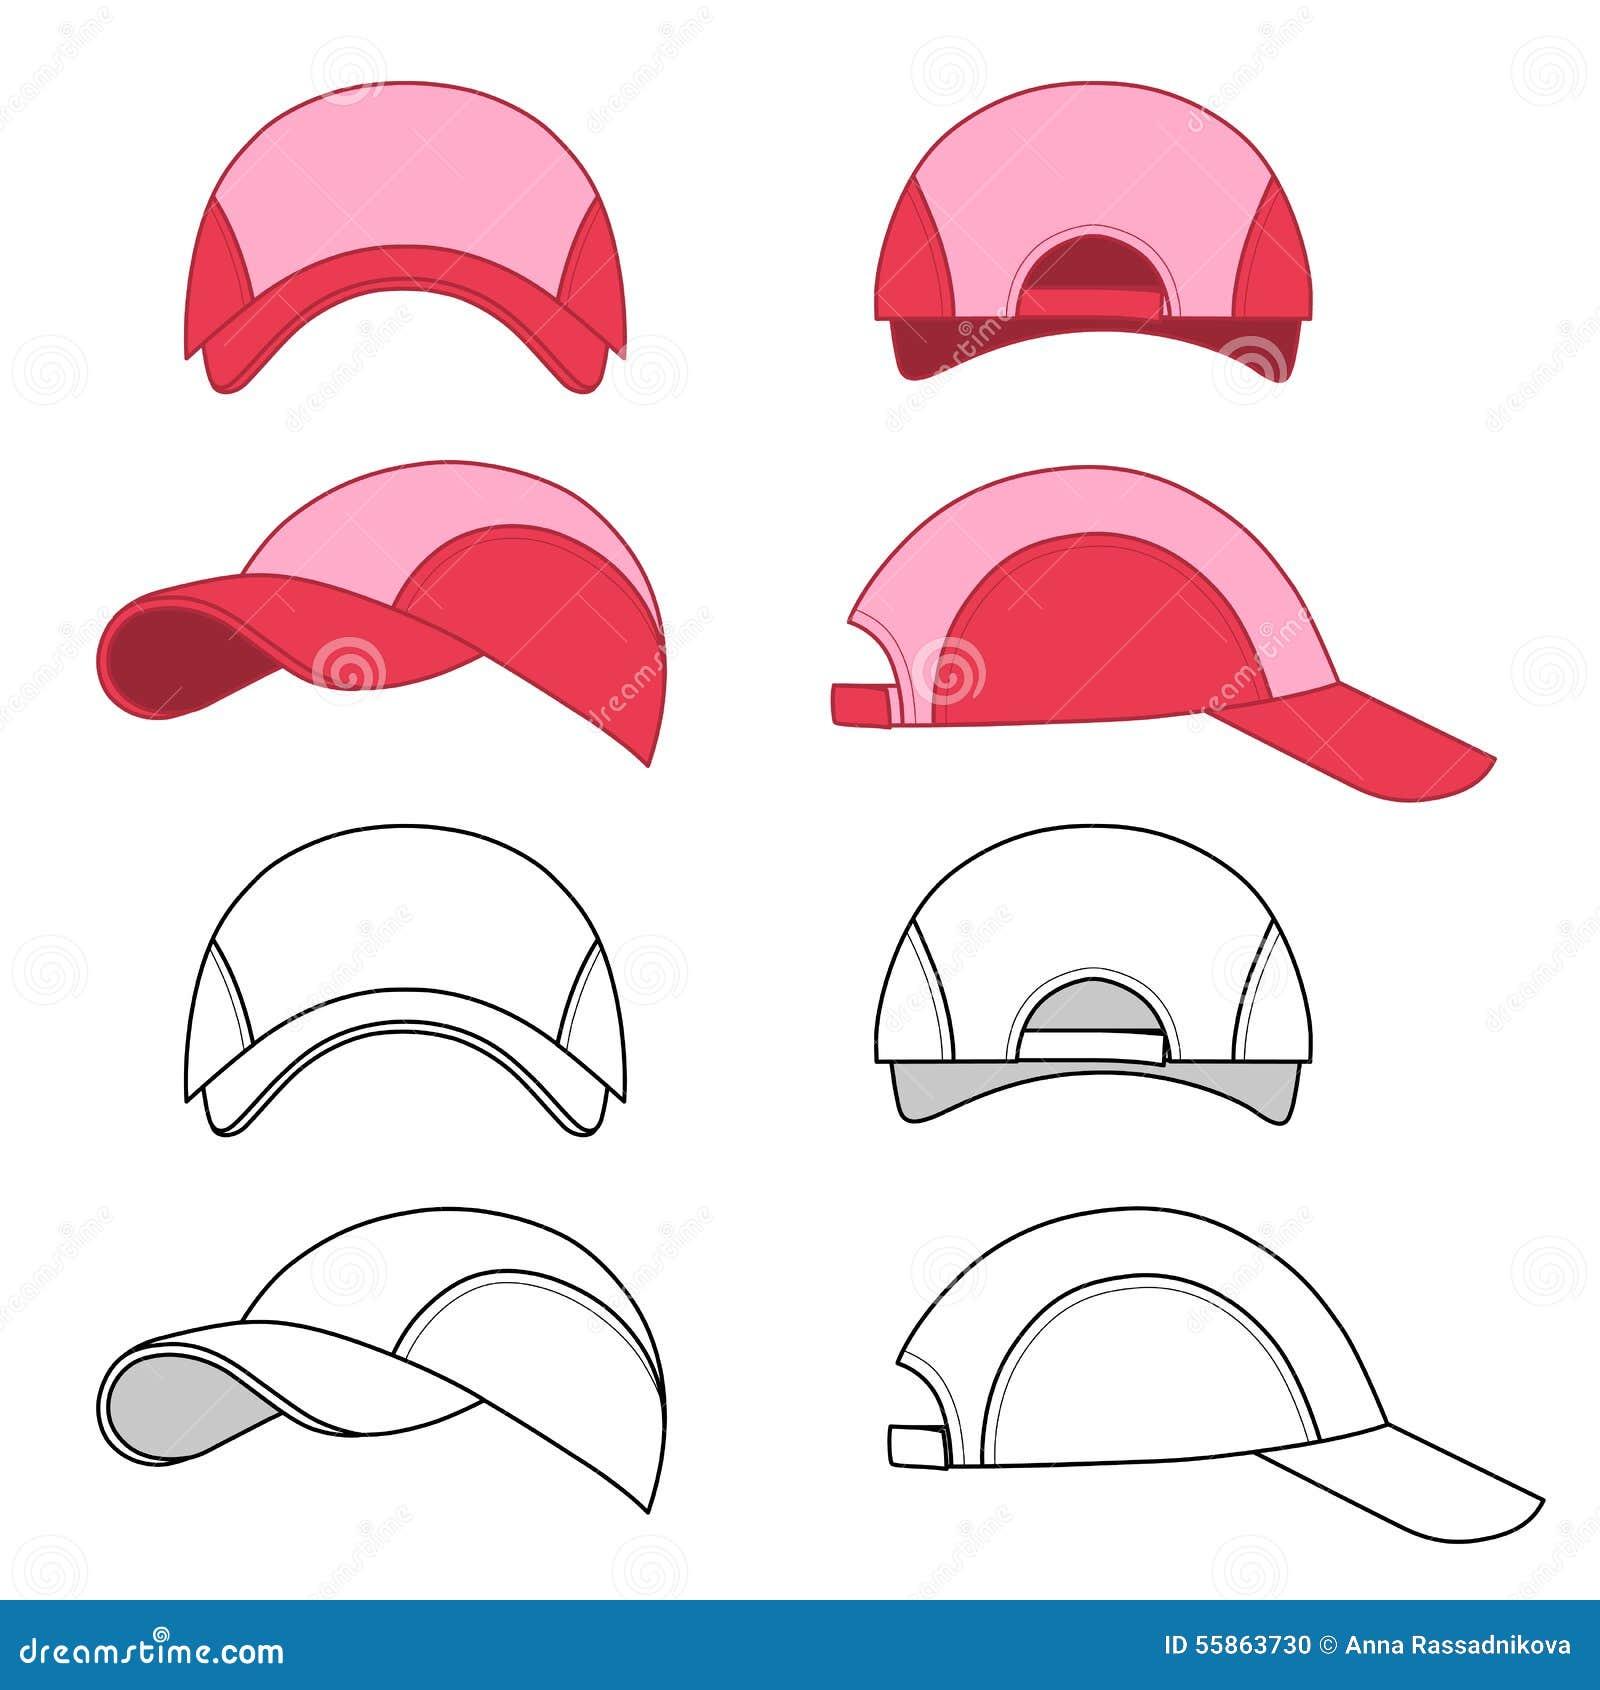 baseball tennis cap outlined template stock vector image 55863730. Black Bedroom Furniture Sets. Home Design Ideas